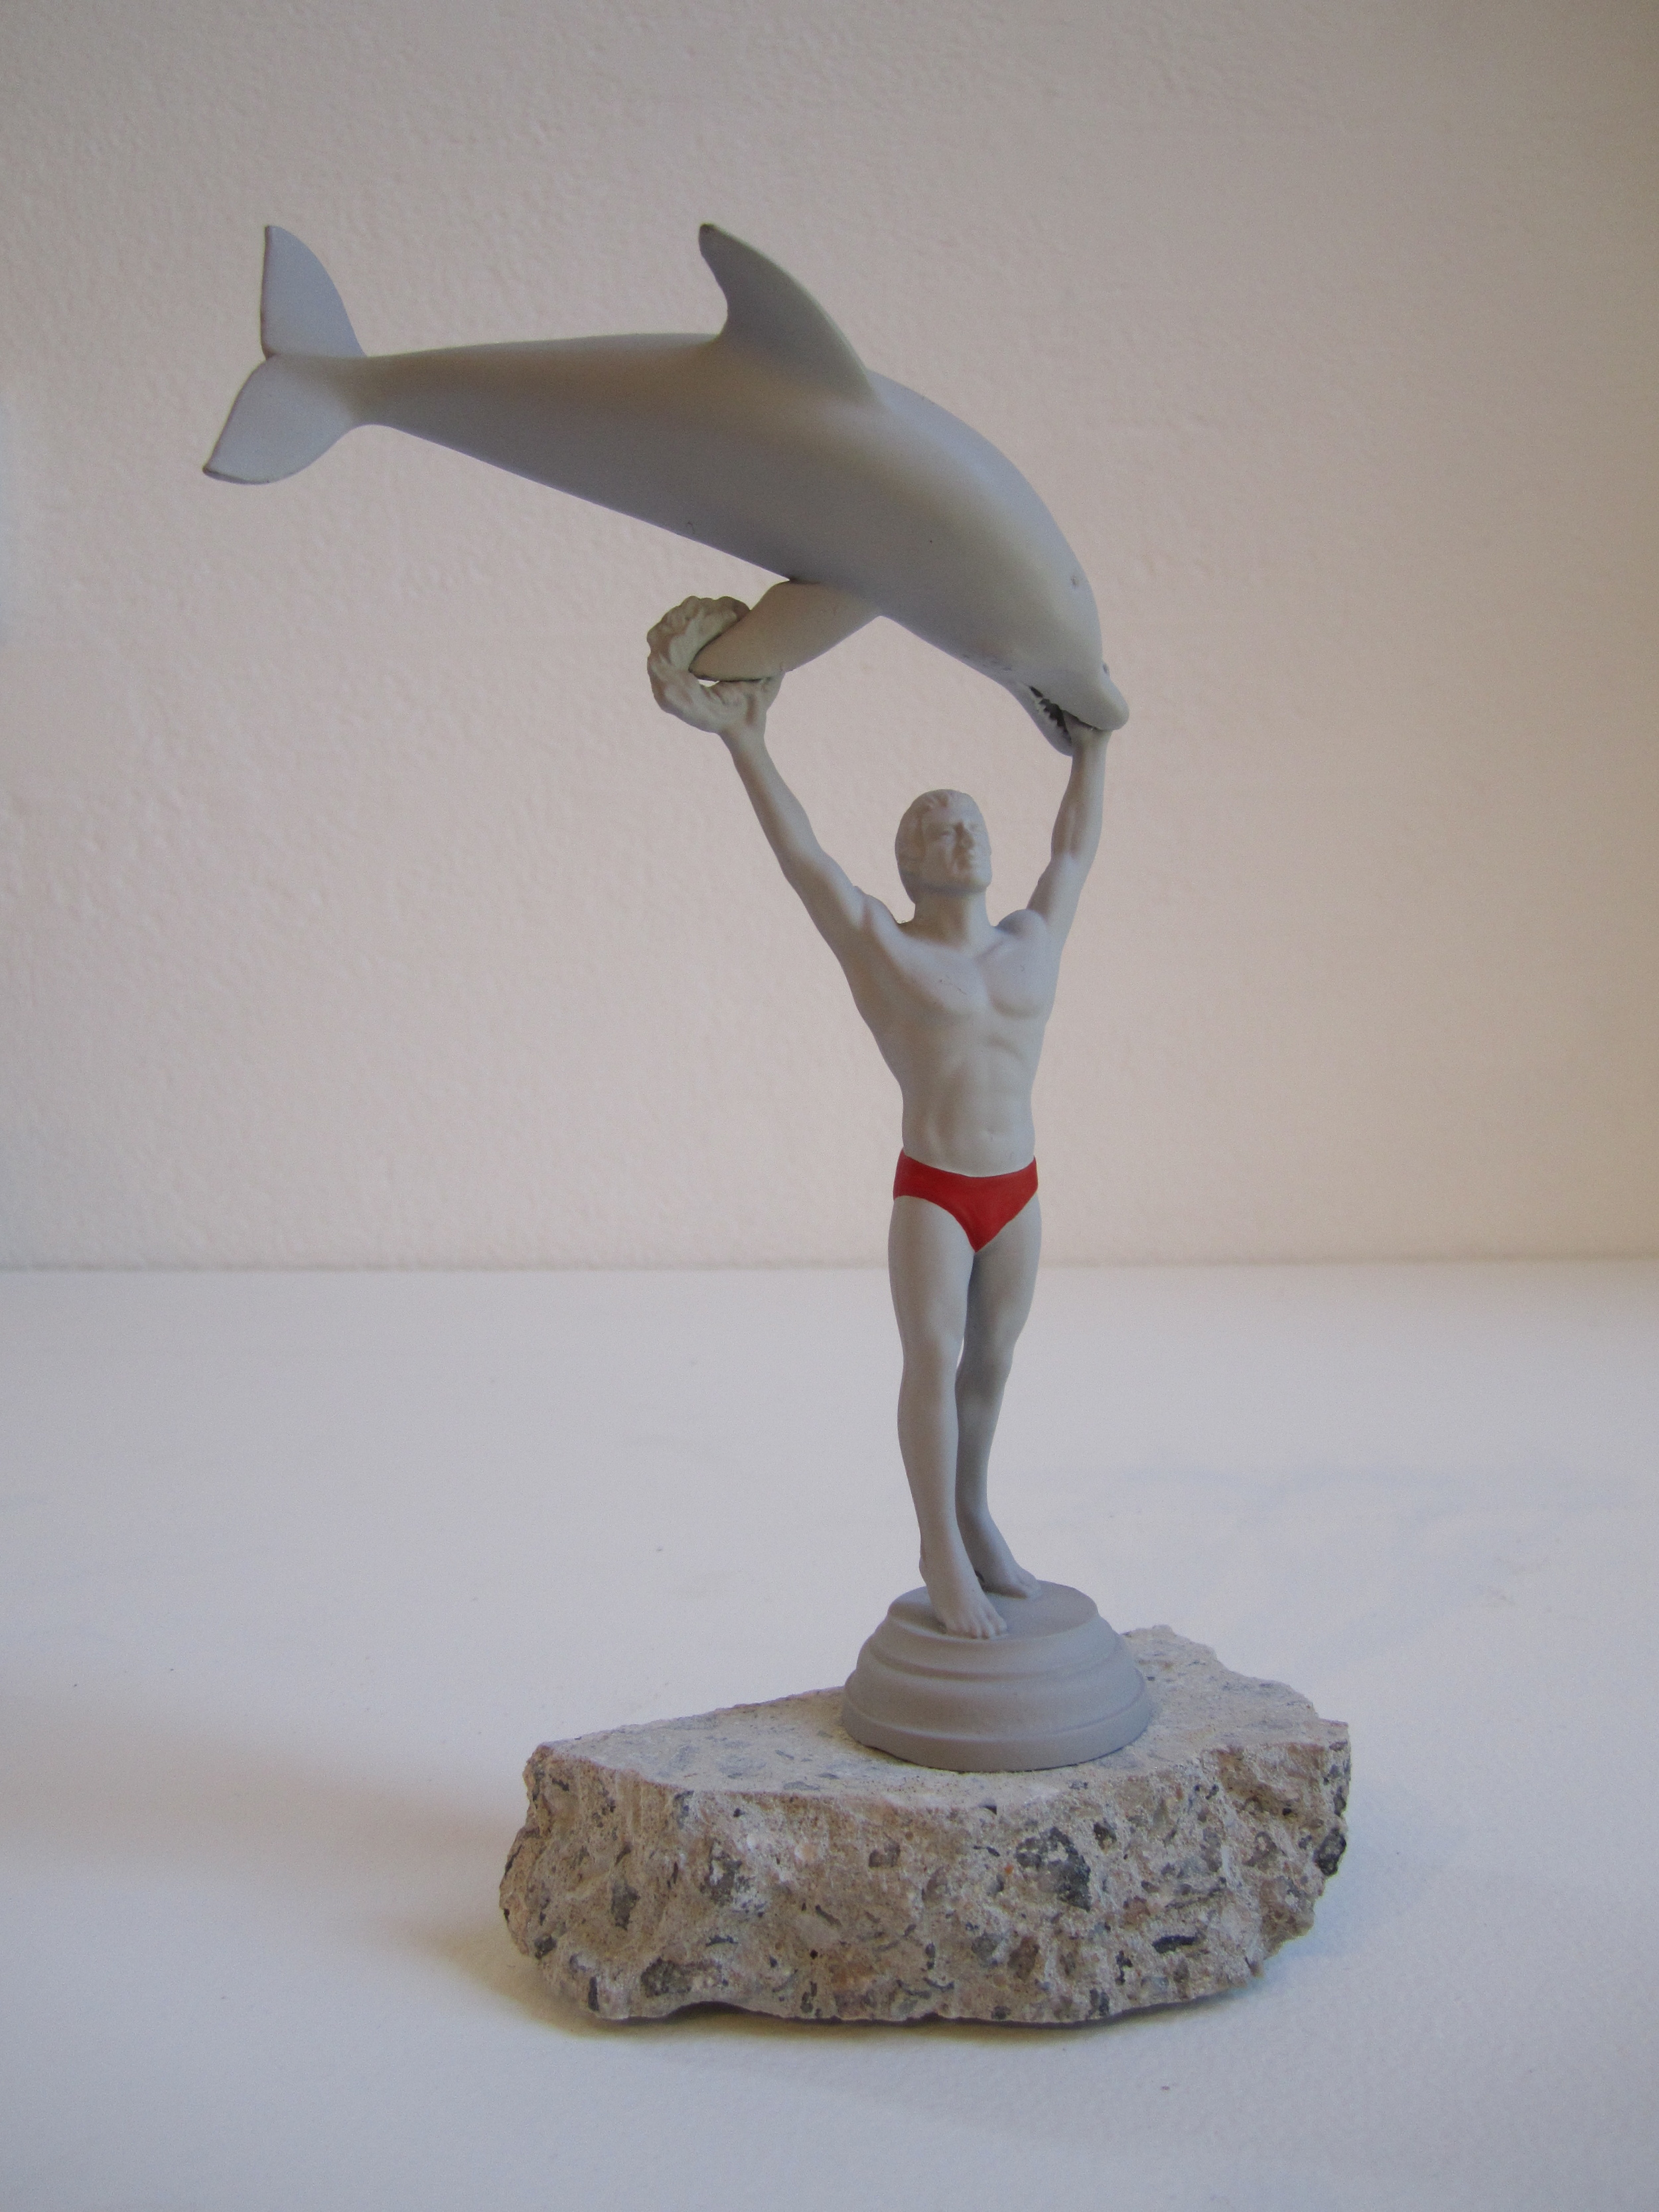 Dolphin Trick, 2011    Enamel on acrylic, concrete 20 x 15 x 6 cm